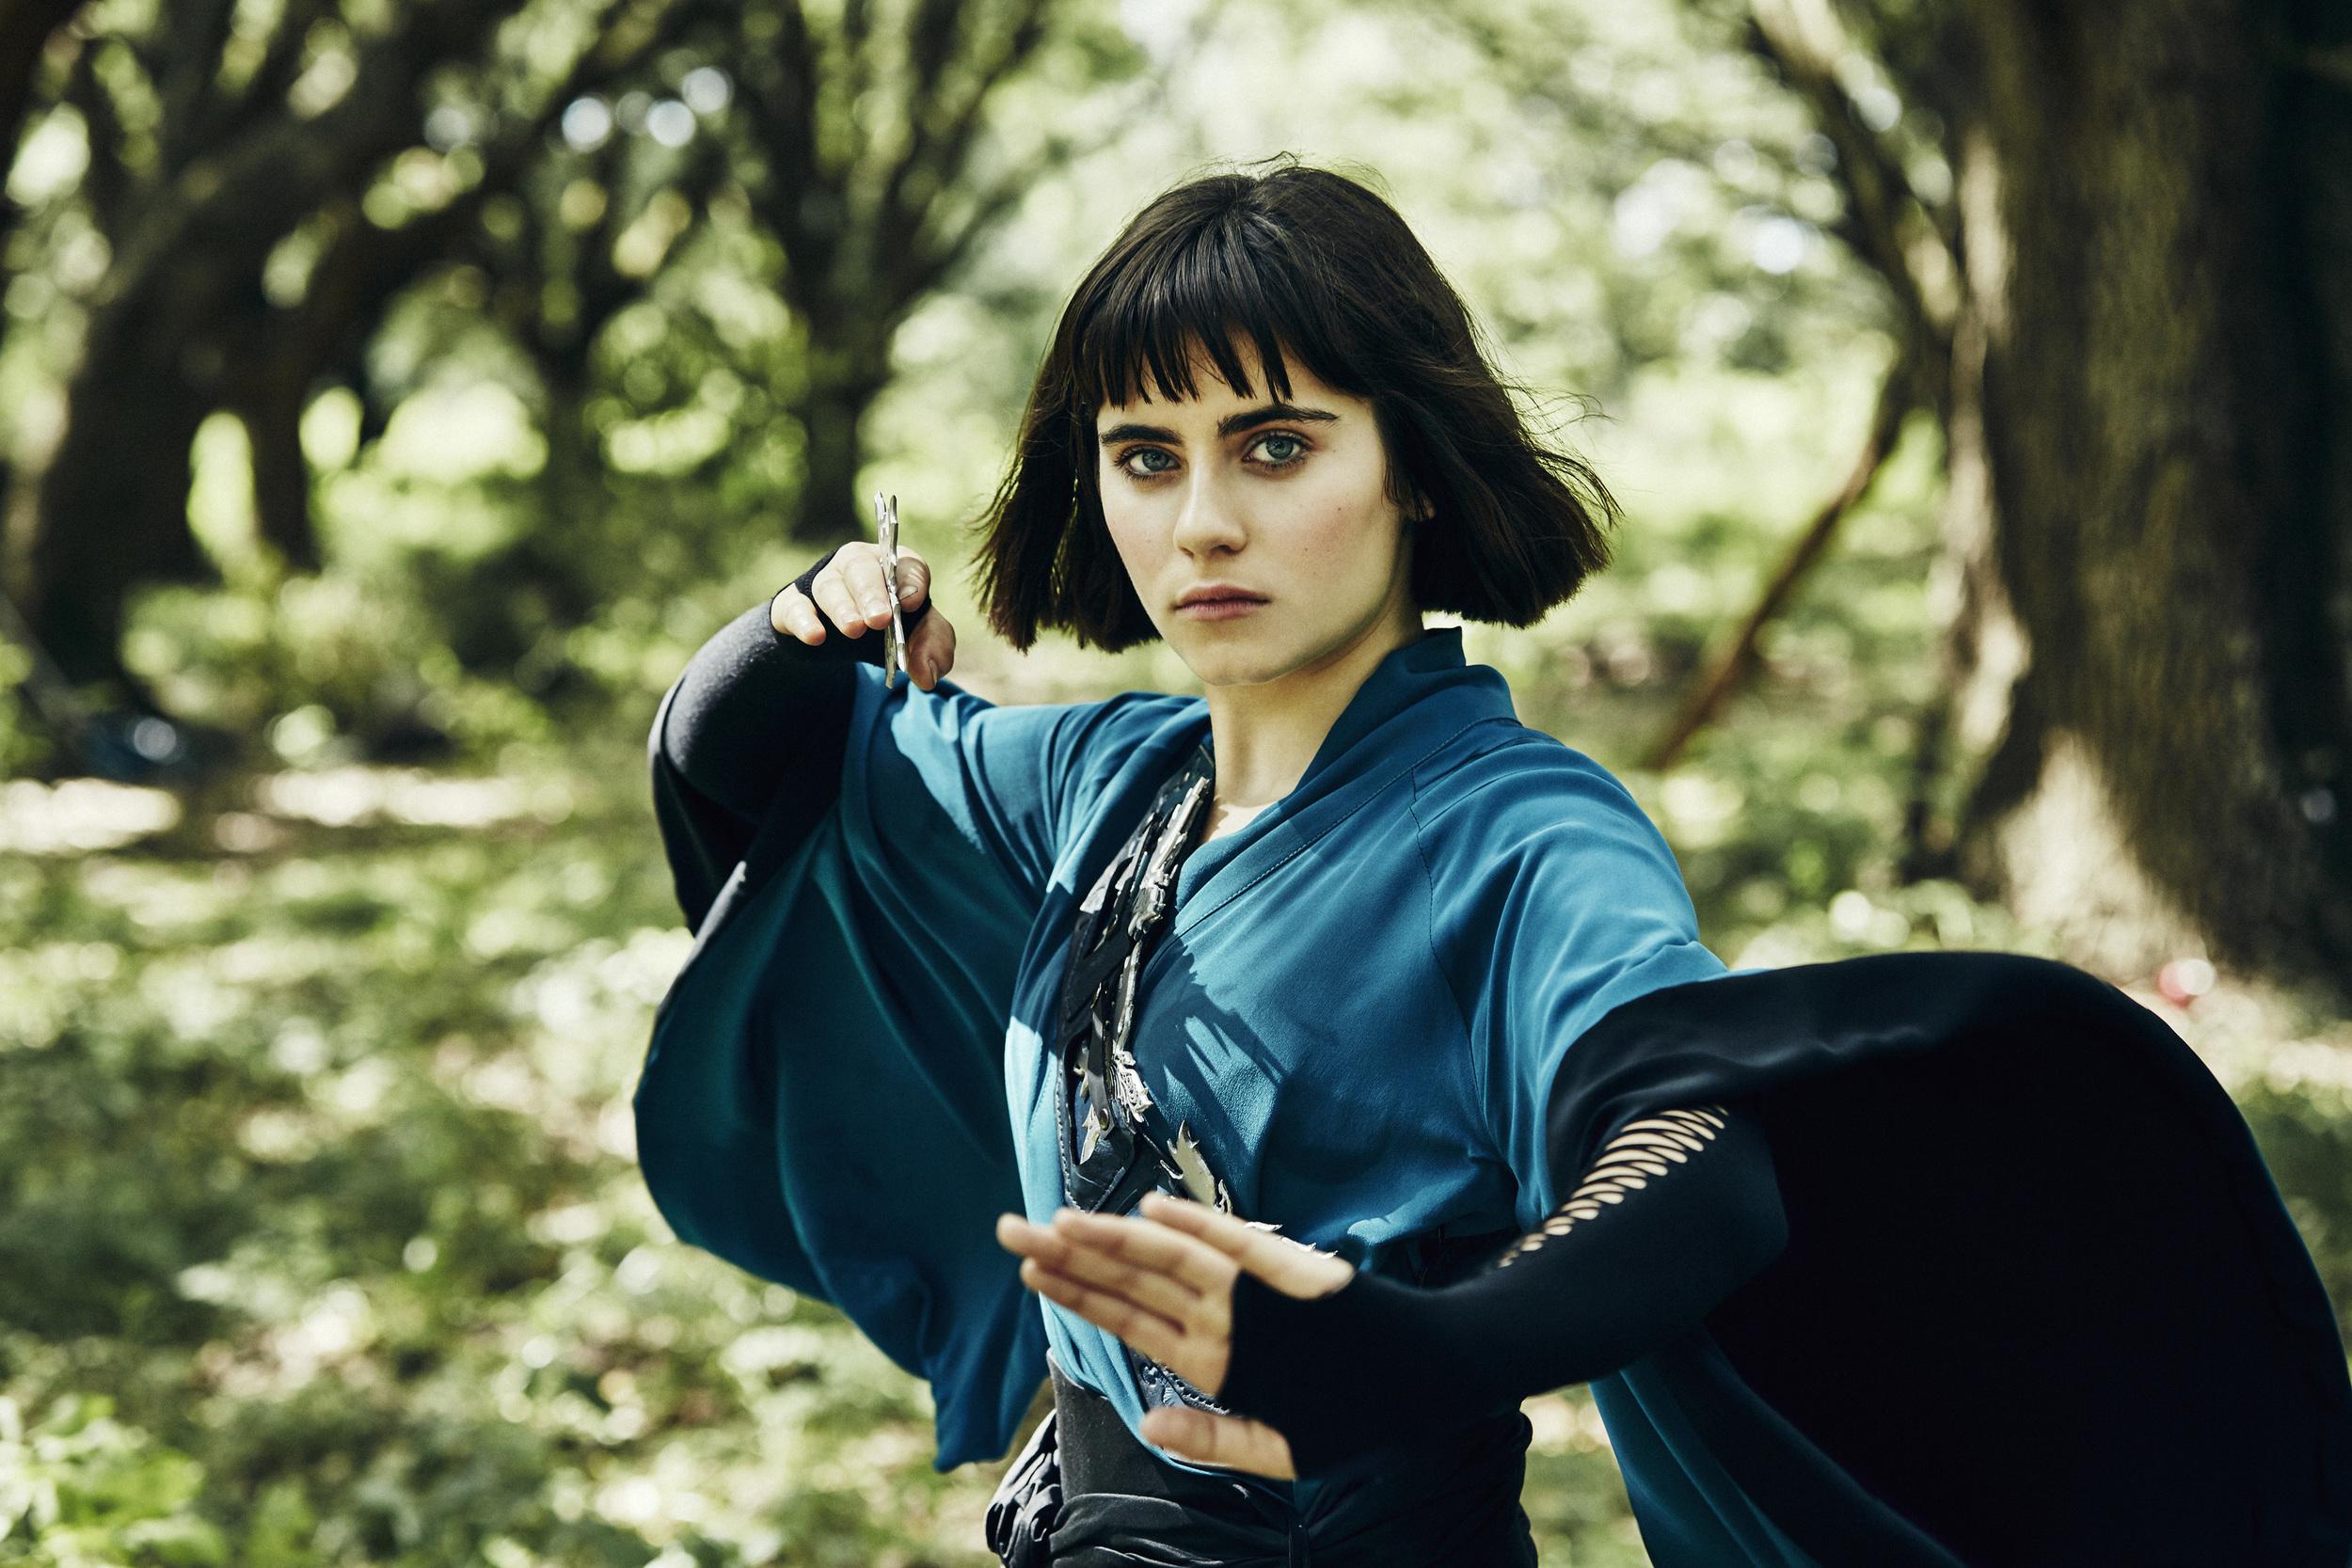 Ally Ioannides as Tilda. Credit: Patti Perret/AMC